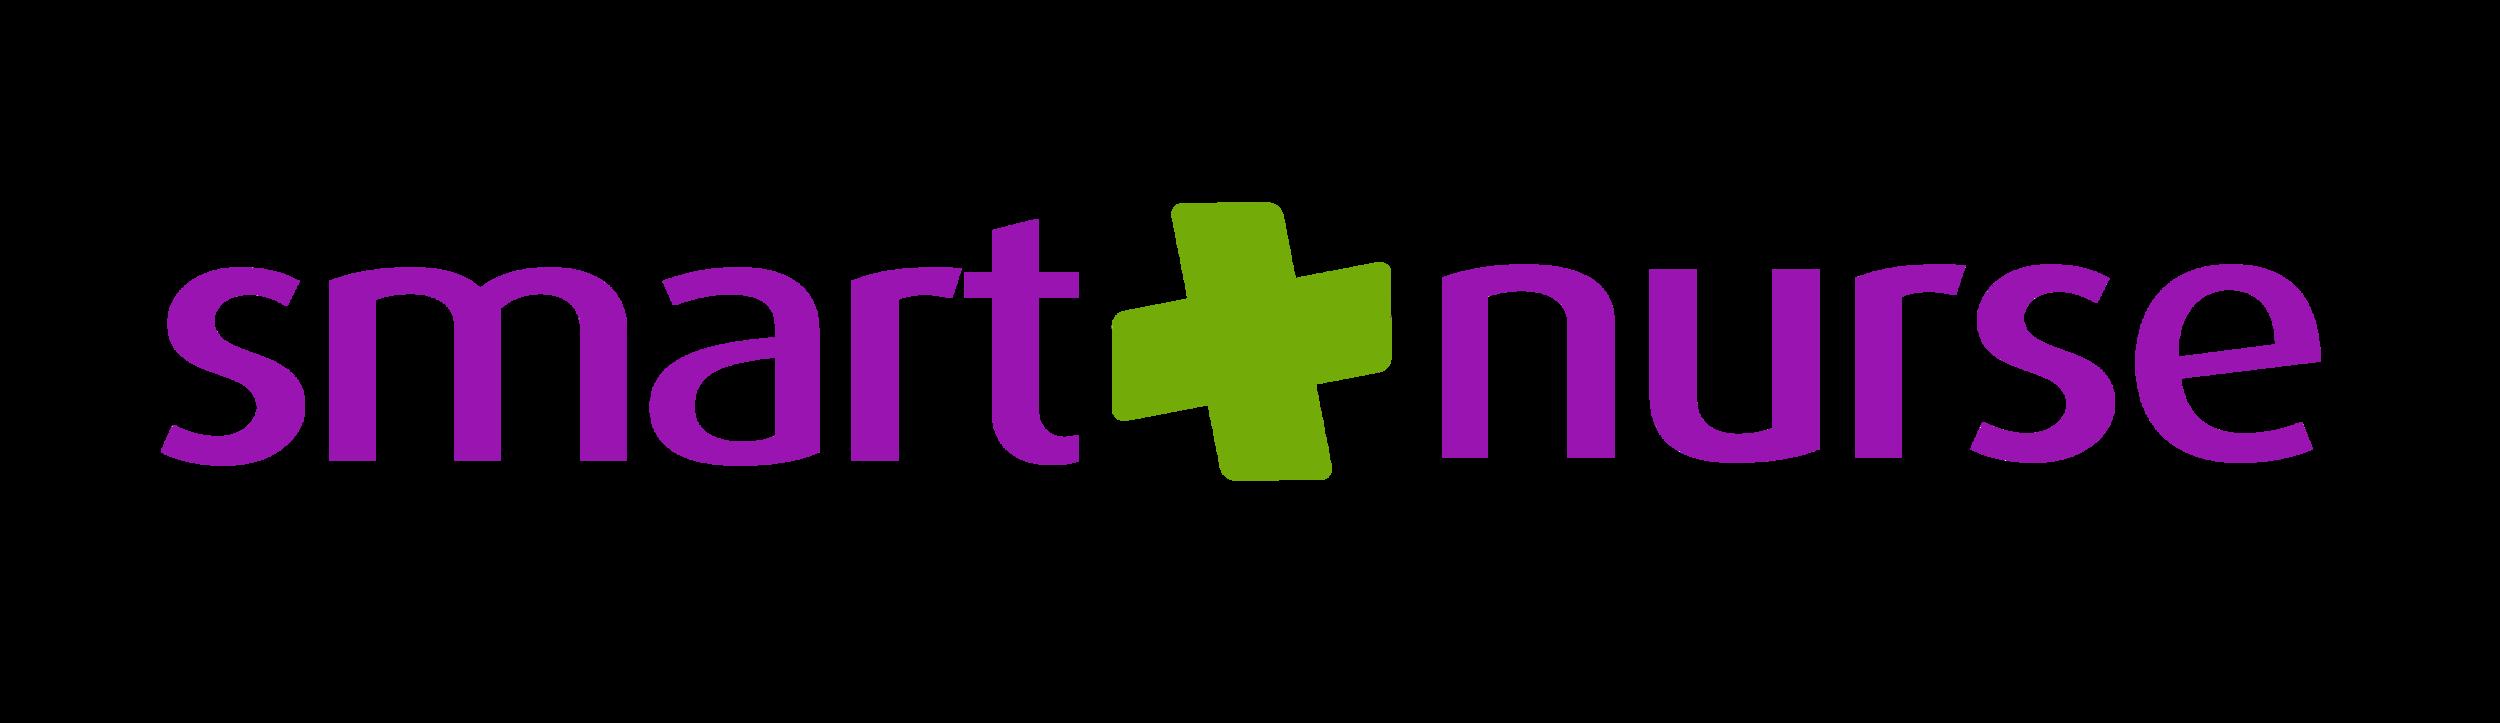 smartNurse_Logo.png